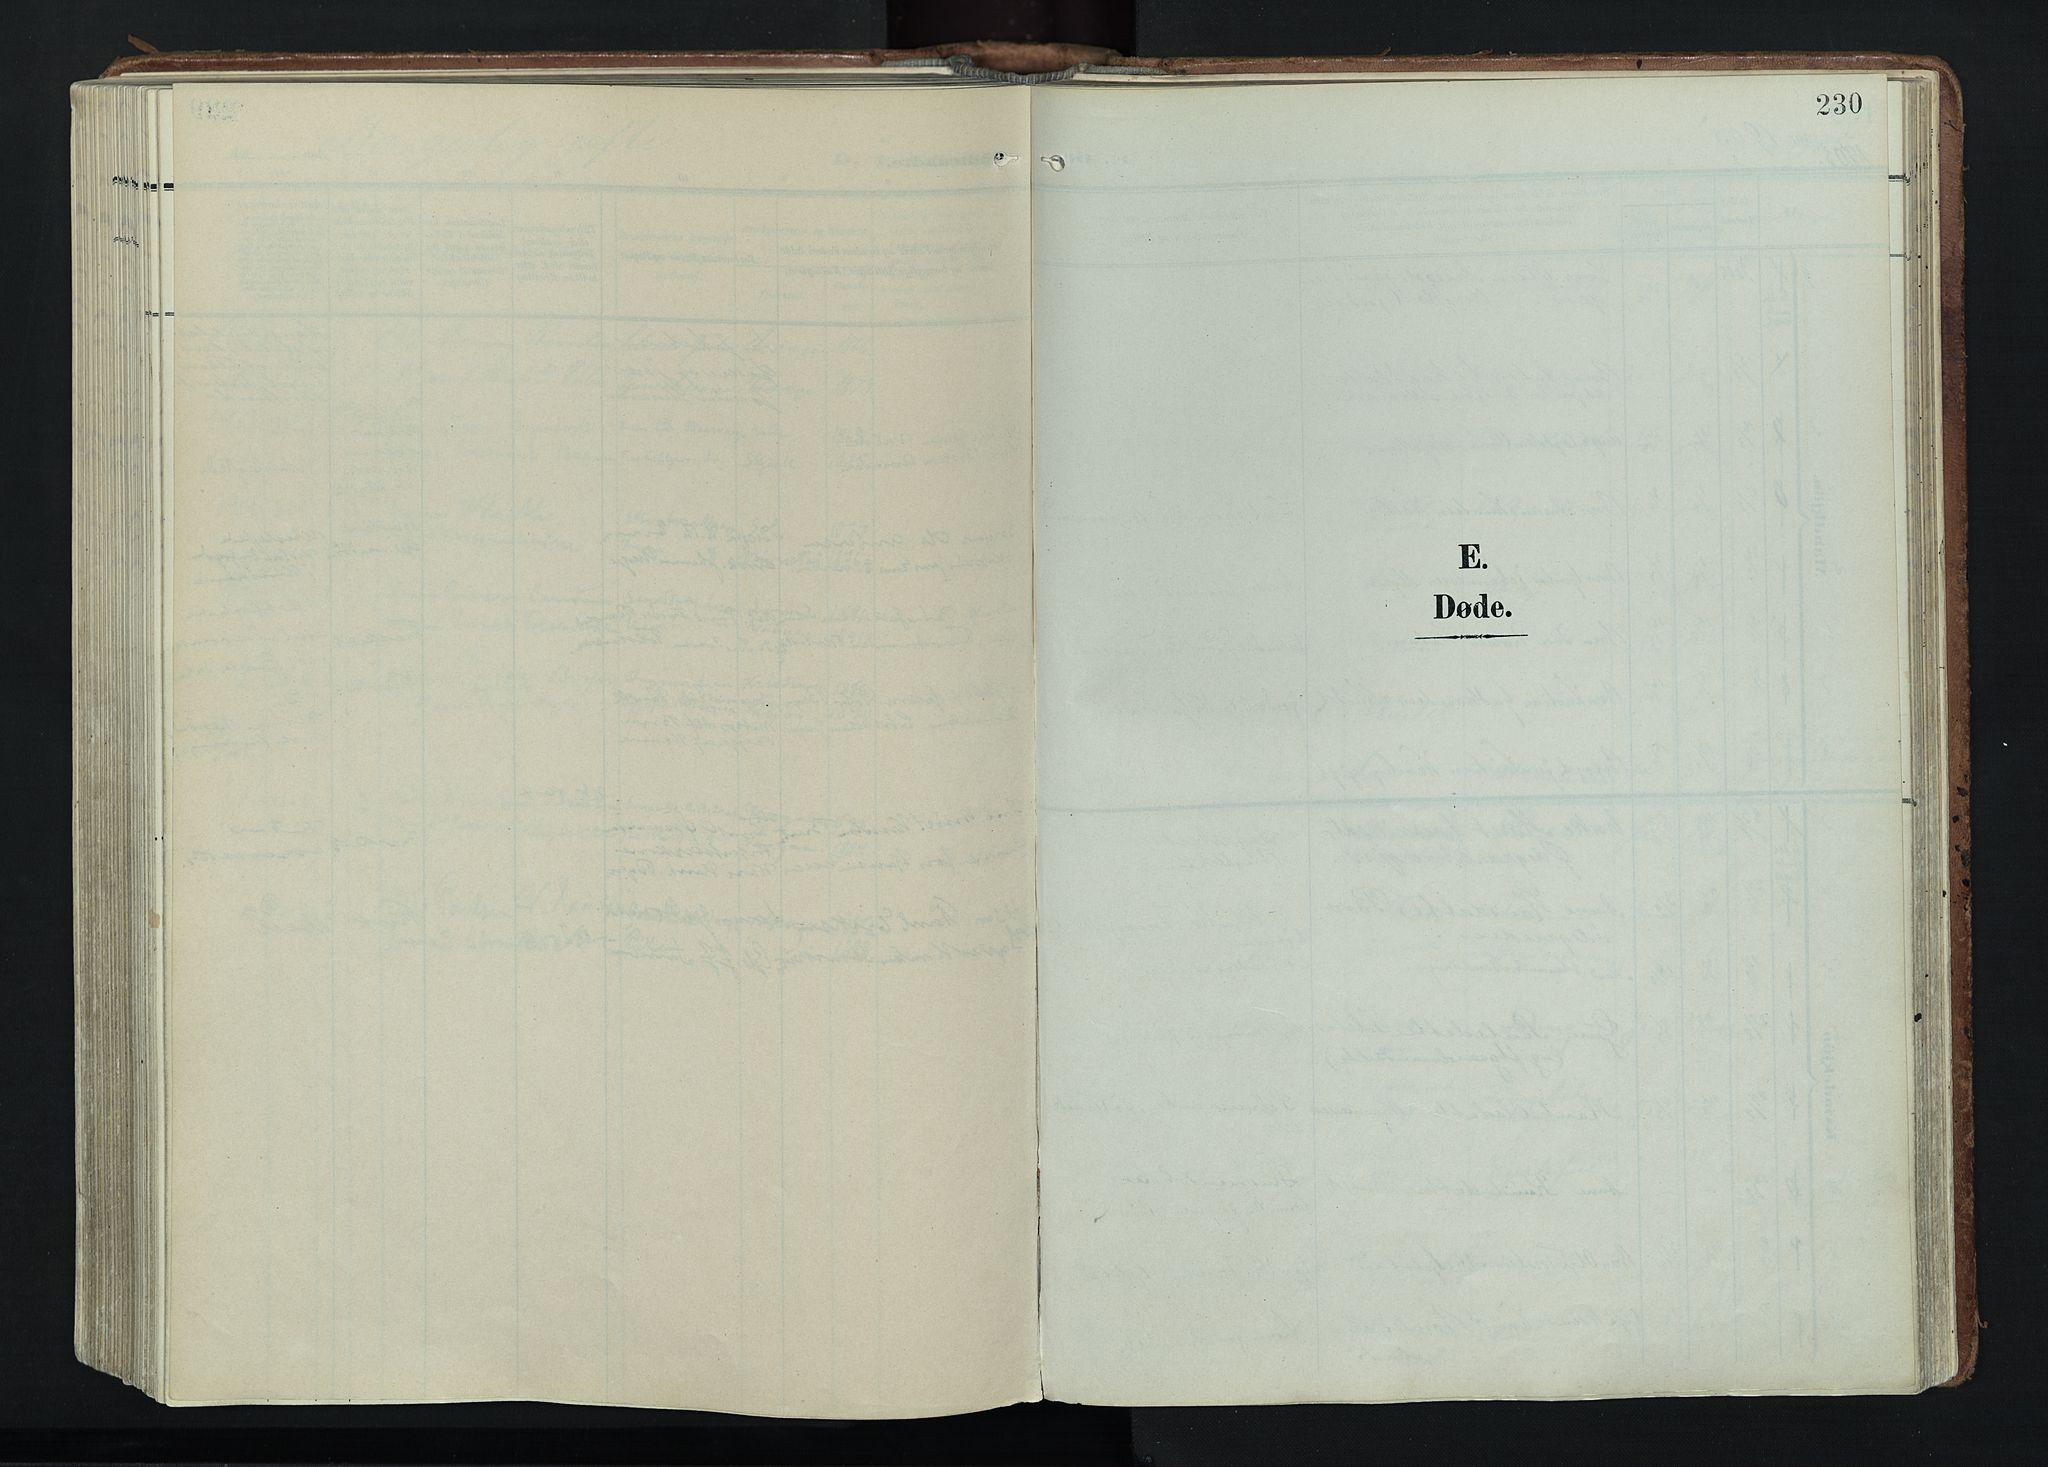 SAH, Vågå prestekontor, Ministerialbok nr. 11, 1905-1924, s. 230